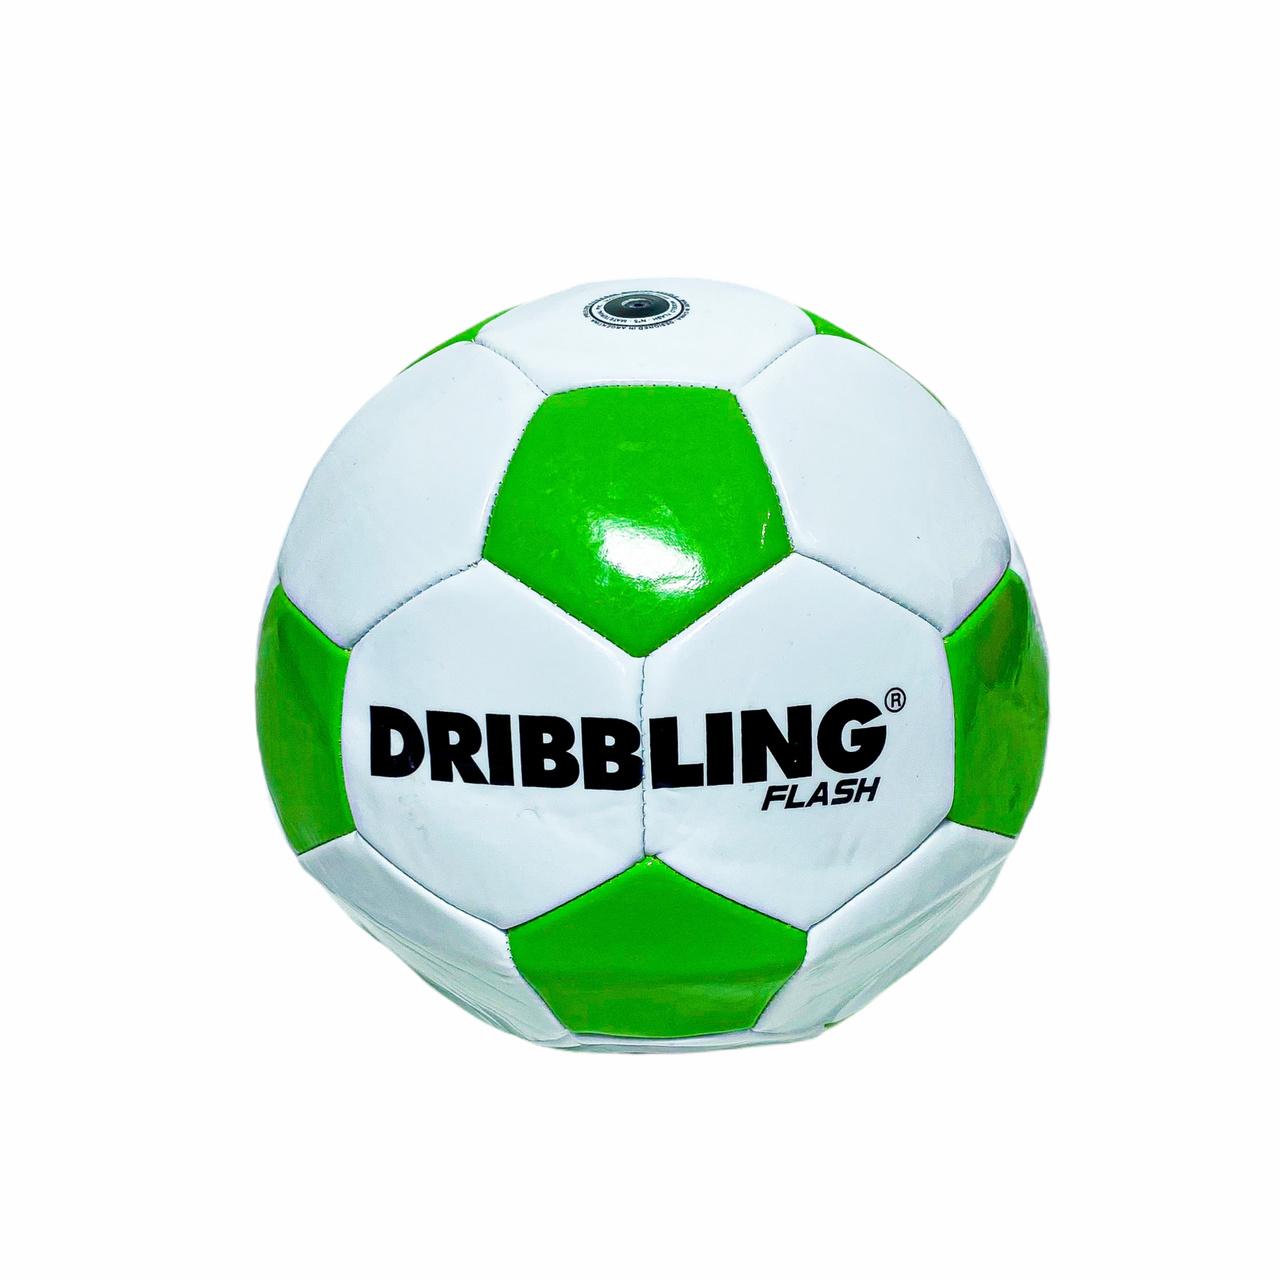 Bola de Futebol nº 5 Dribbling Flash Branca e Verde